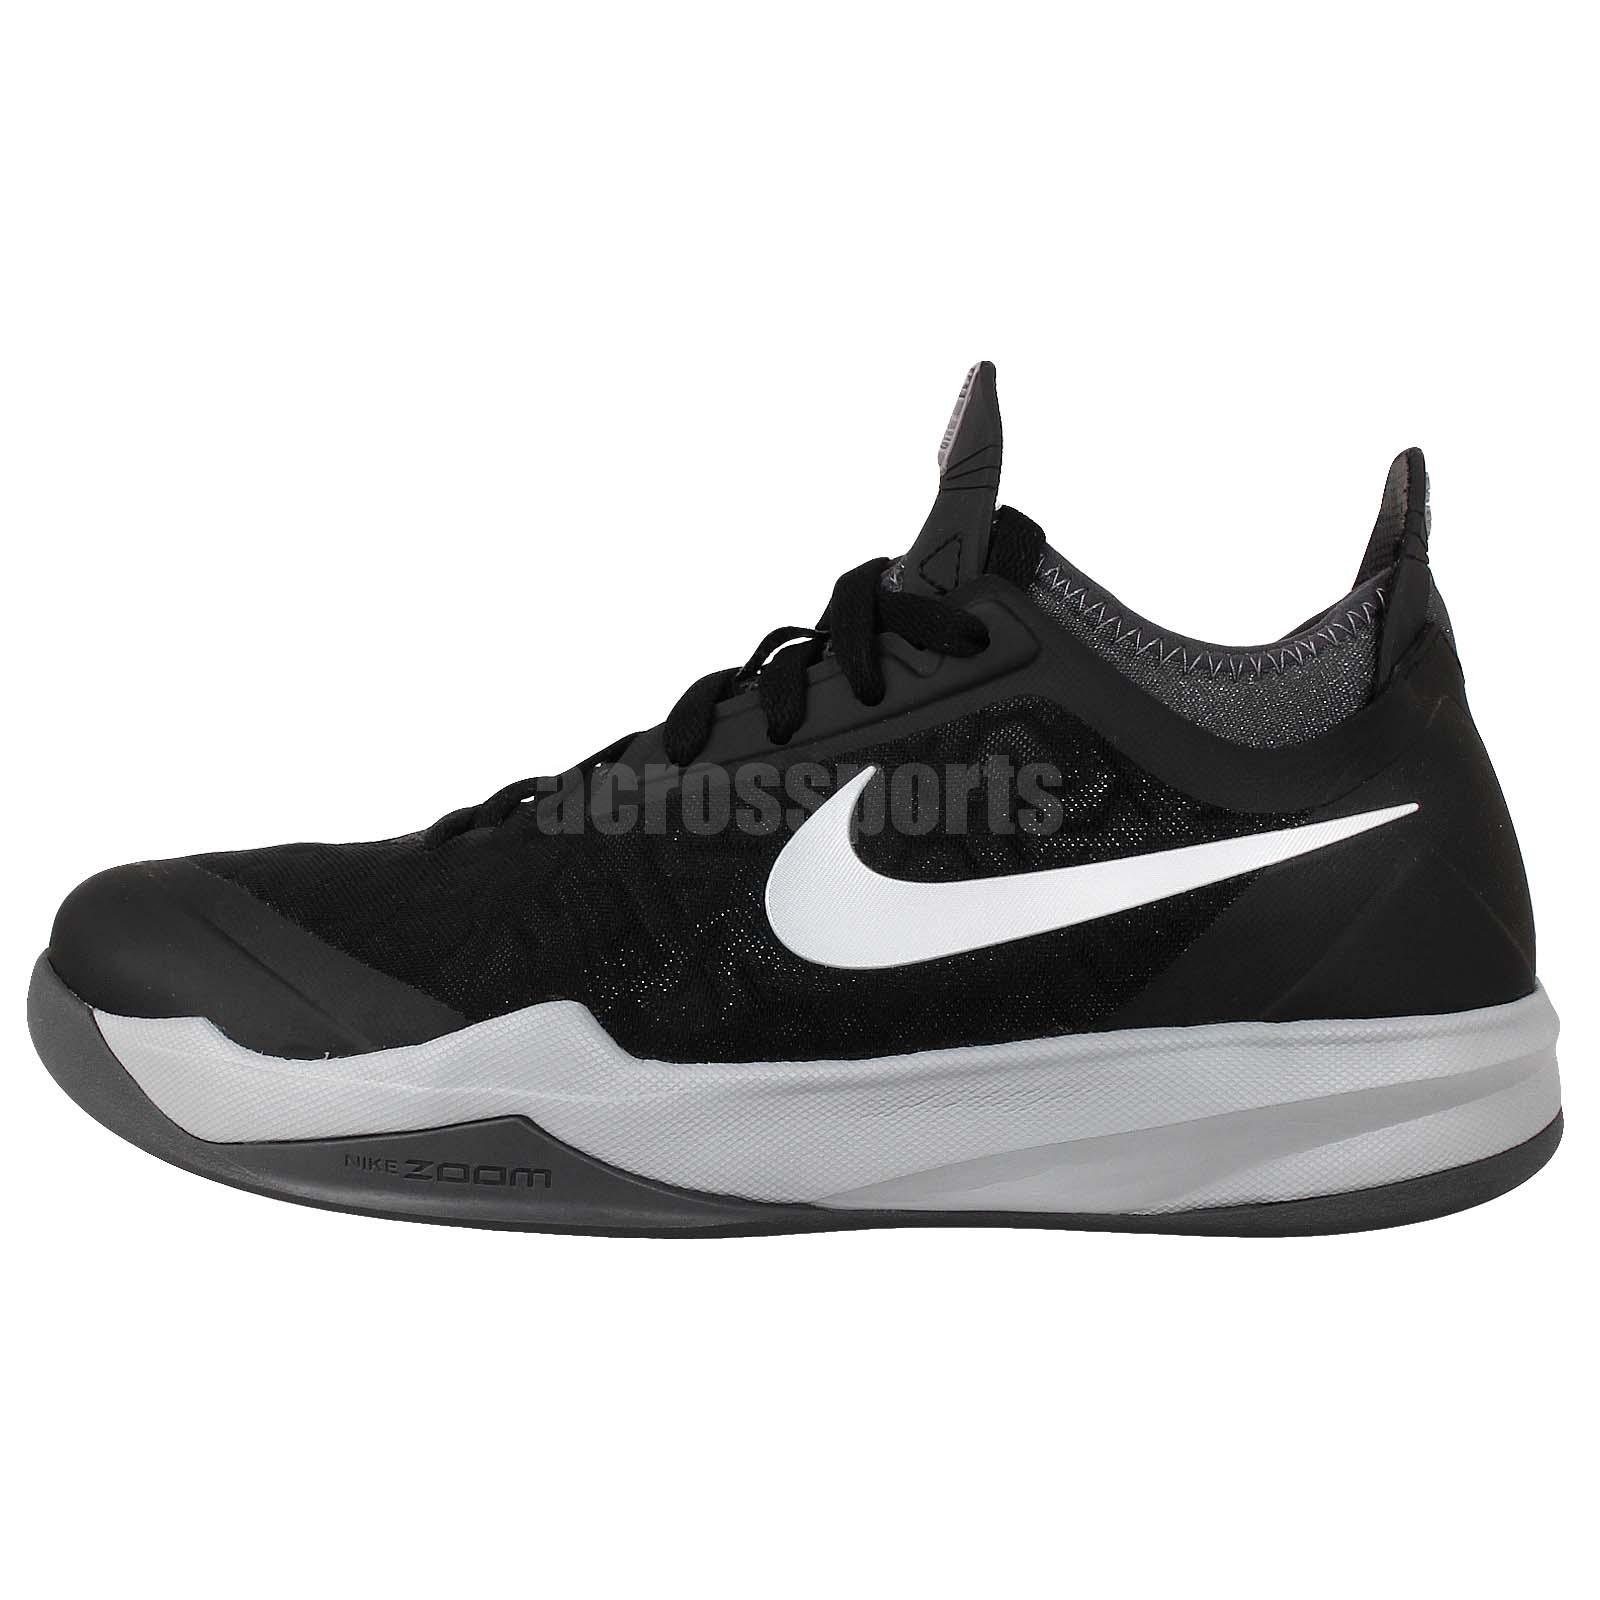 Nike crusader 2014